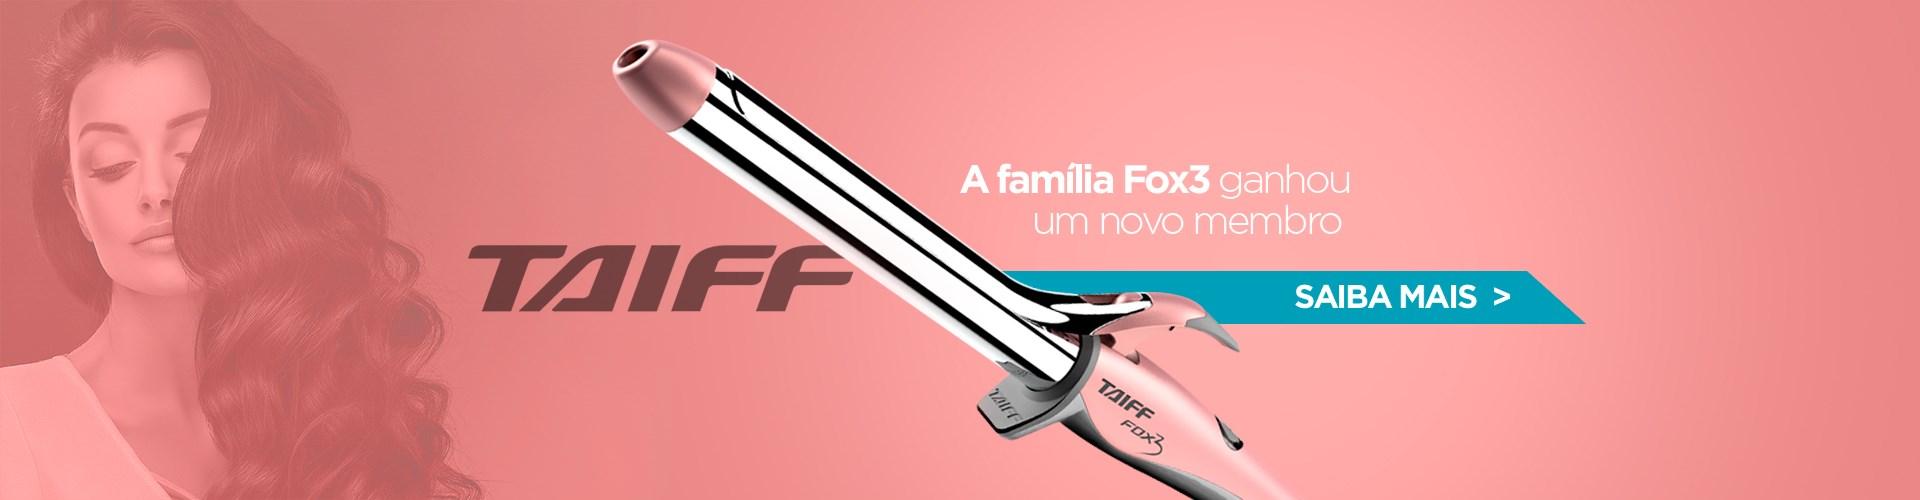 Modelador Taiff Fox 3